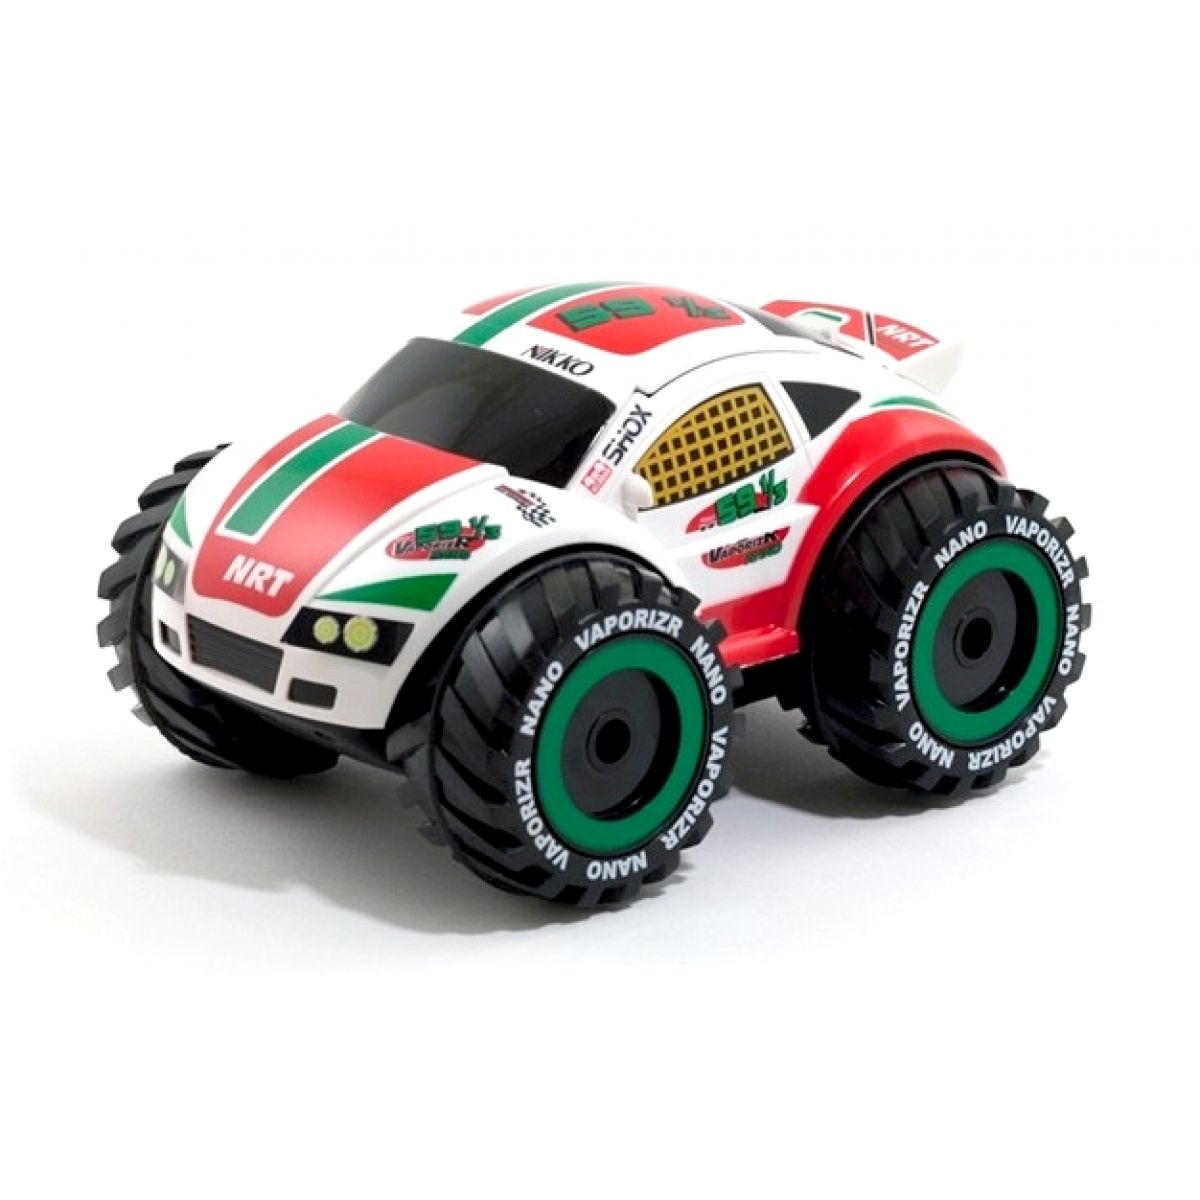 Nikko RC Auto Nano VaporizR - Zelená